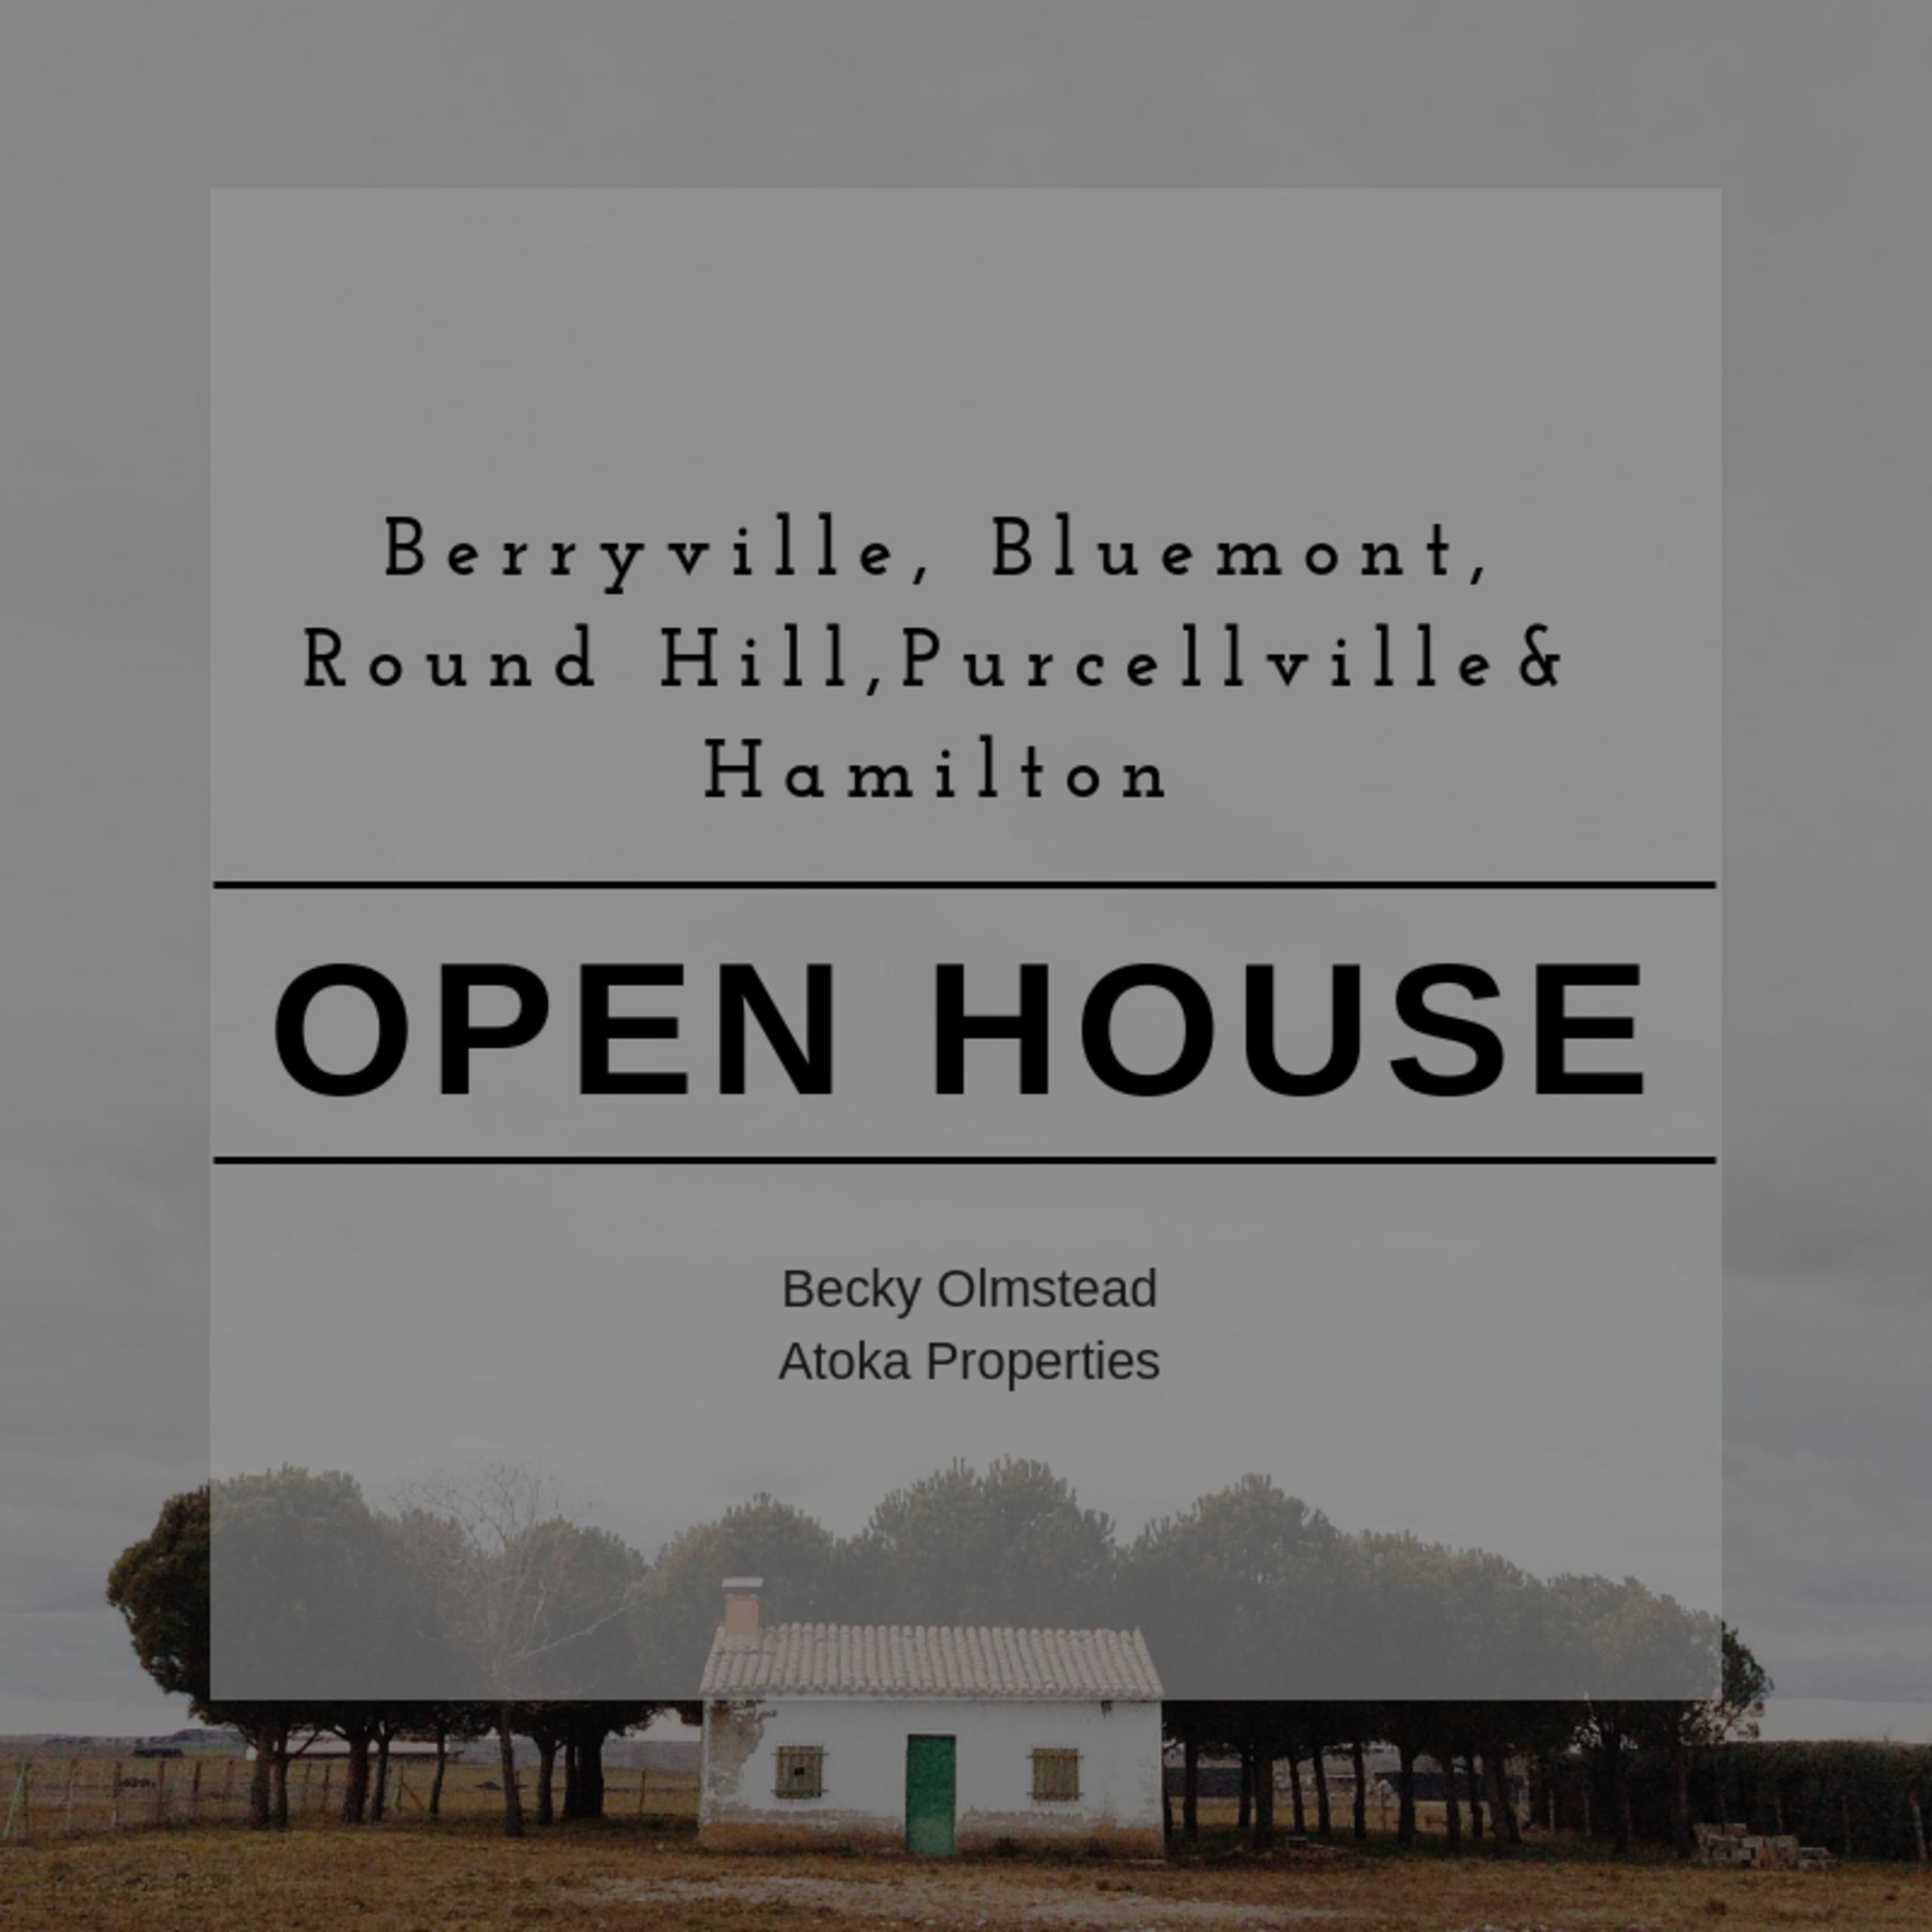 OPEN HOUSE LIST 9/20/18 – 921/18